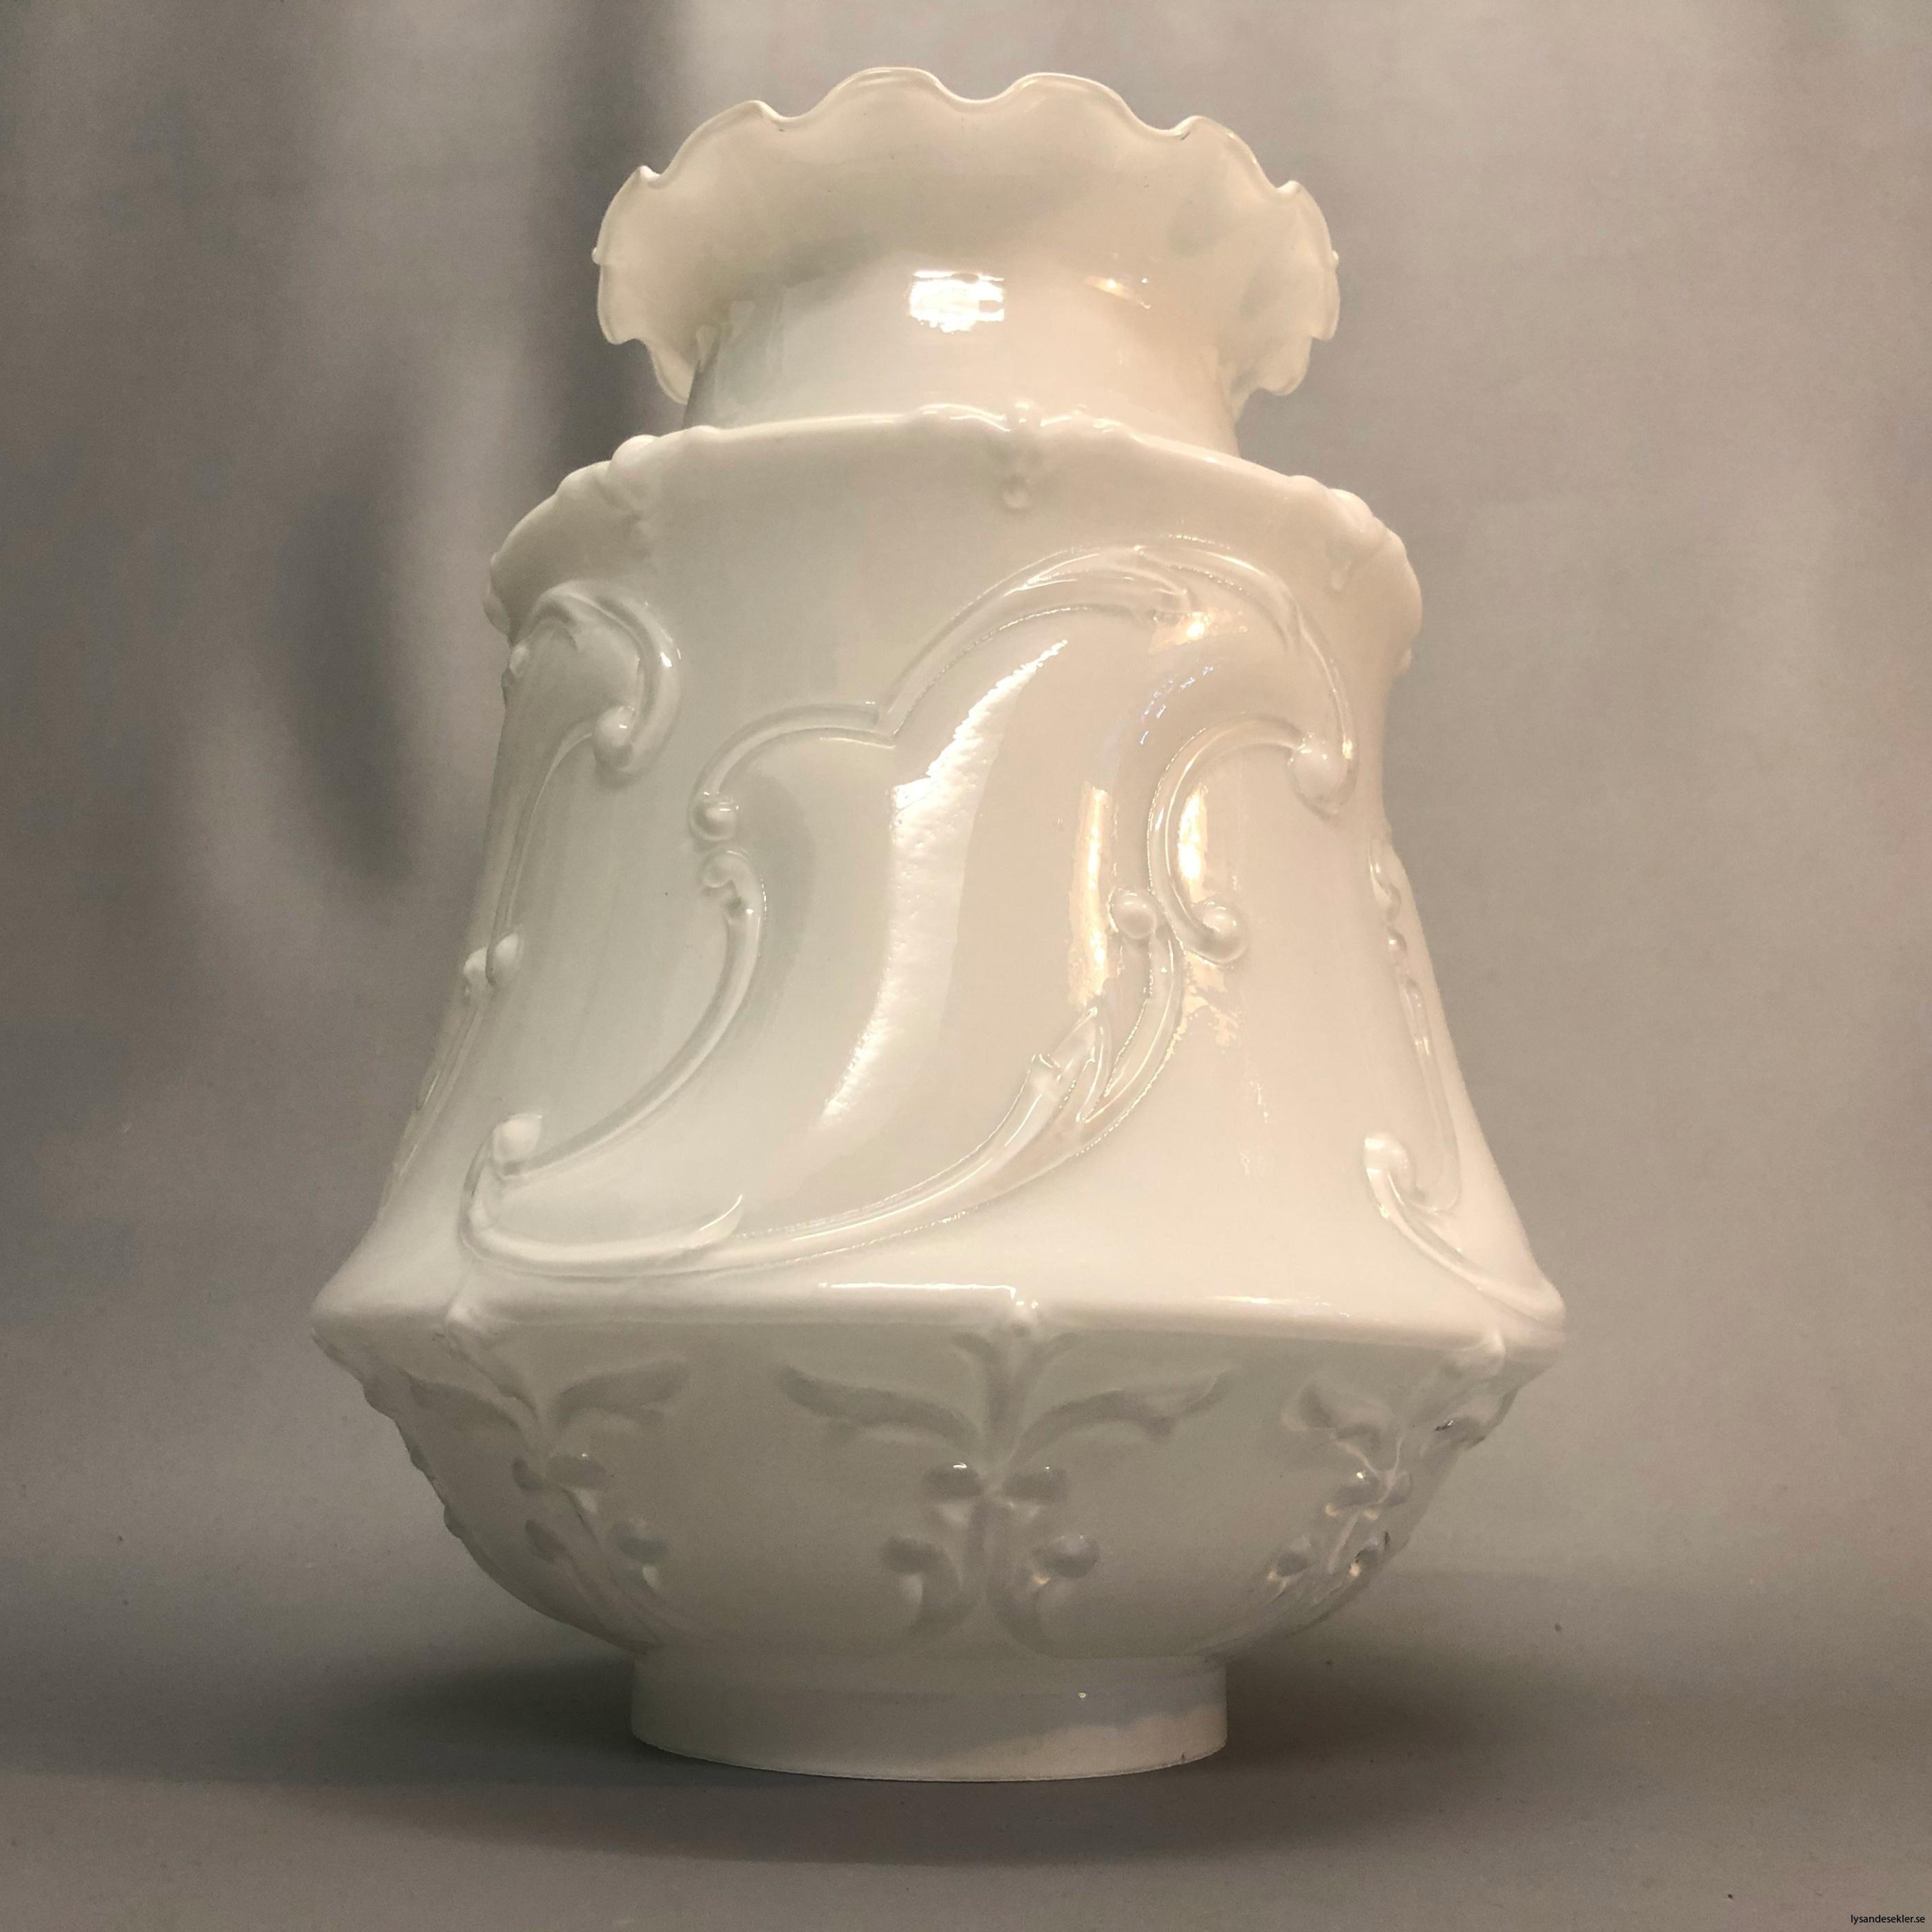 fotogenlampskupa kupa till fotogenlampa tulipan tulpan tulpankupor kupor12